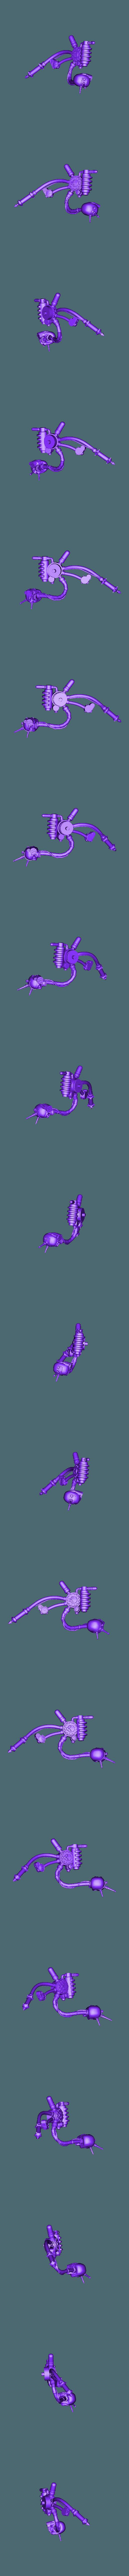 Princeps_backpack.stl Download free STL file Martian Leader of Stealthy Intruders • 3D printing template, ErikTheHeretek